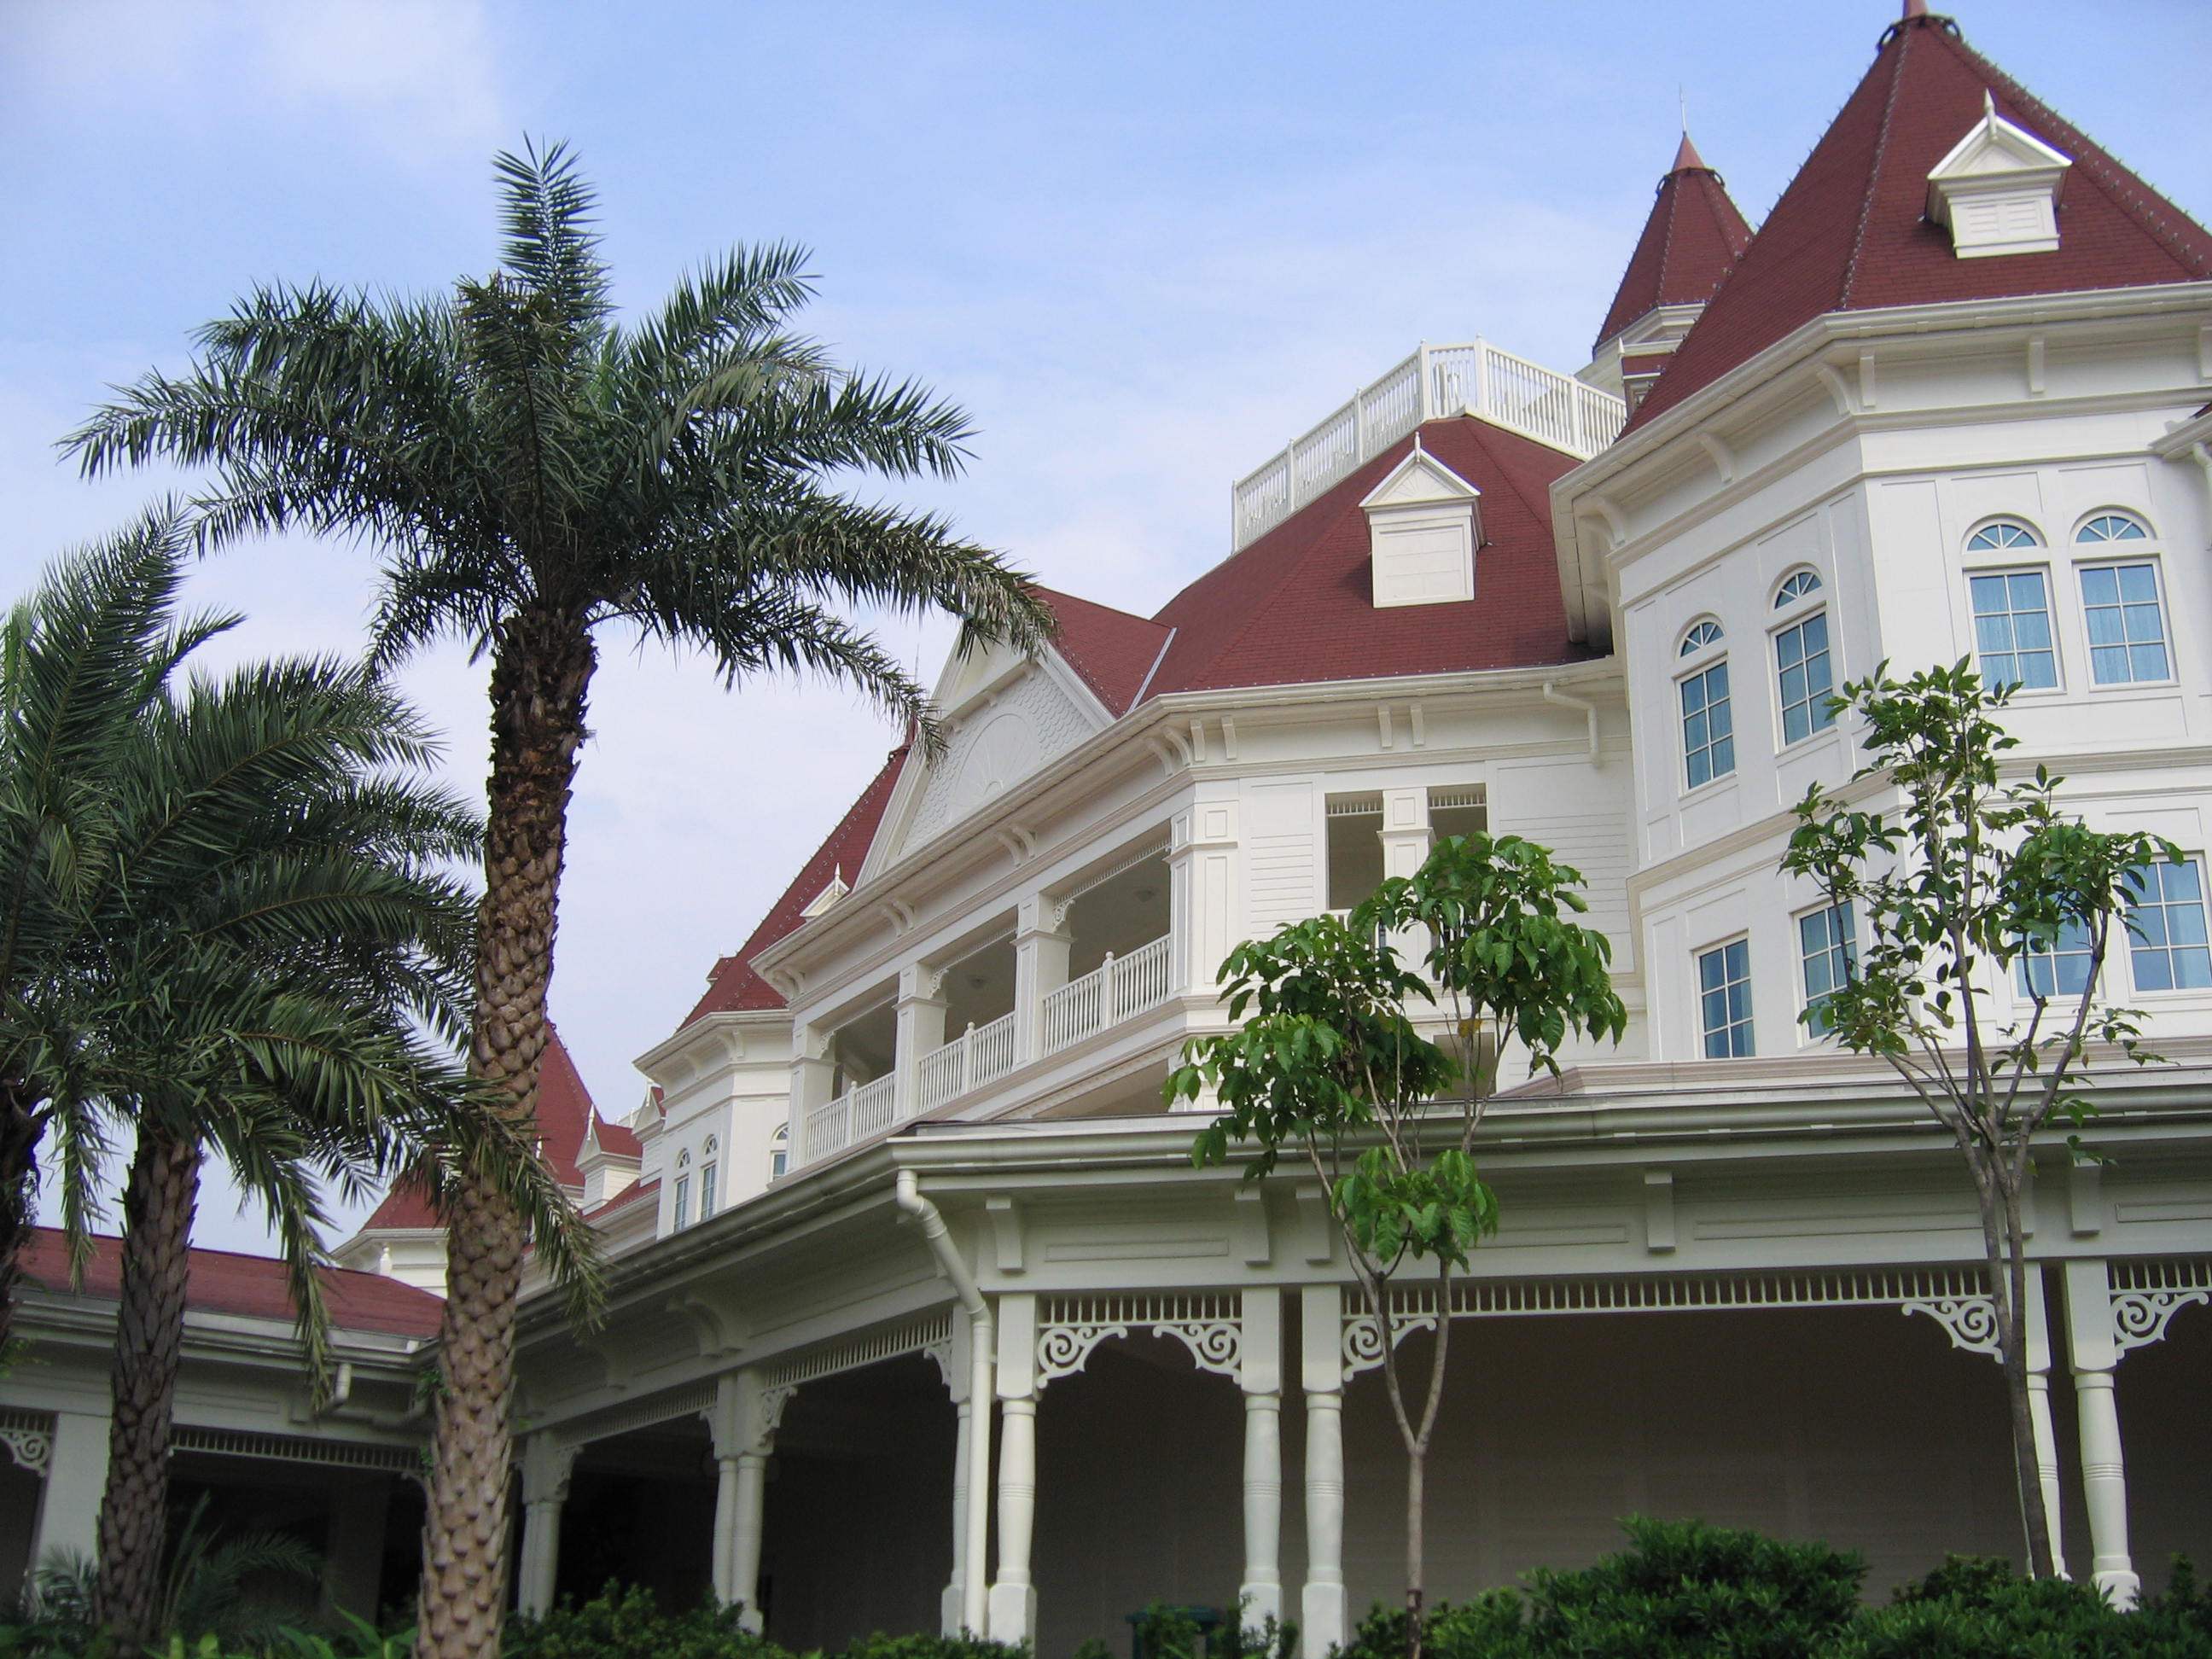 File:Hk disneyland hotel.jpg - Wikimedia Commons